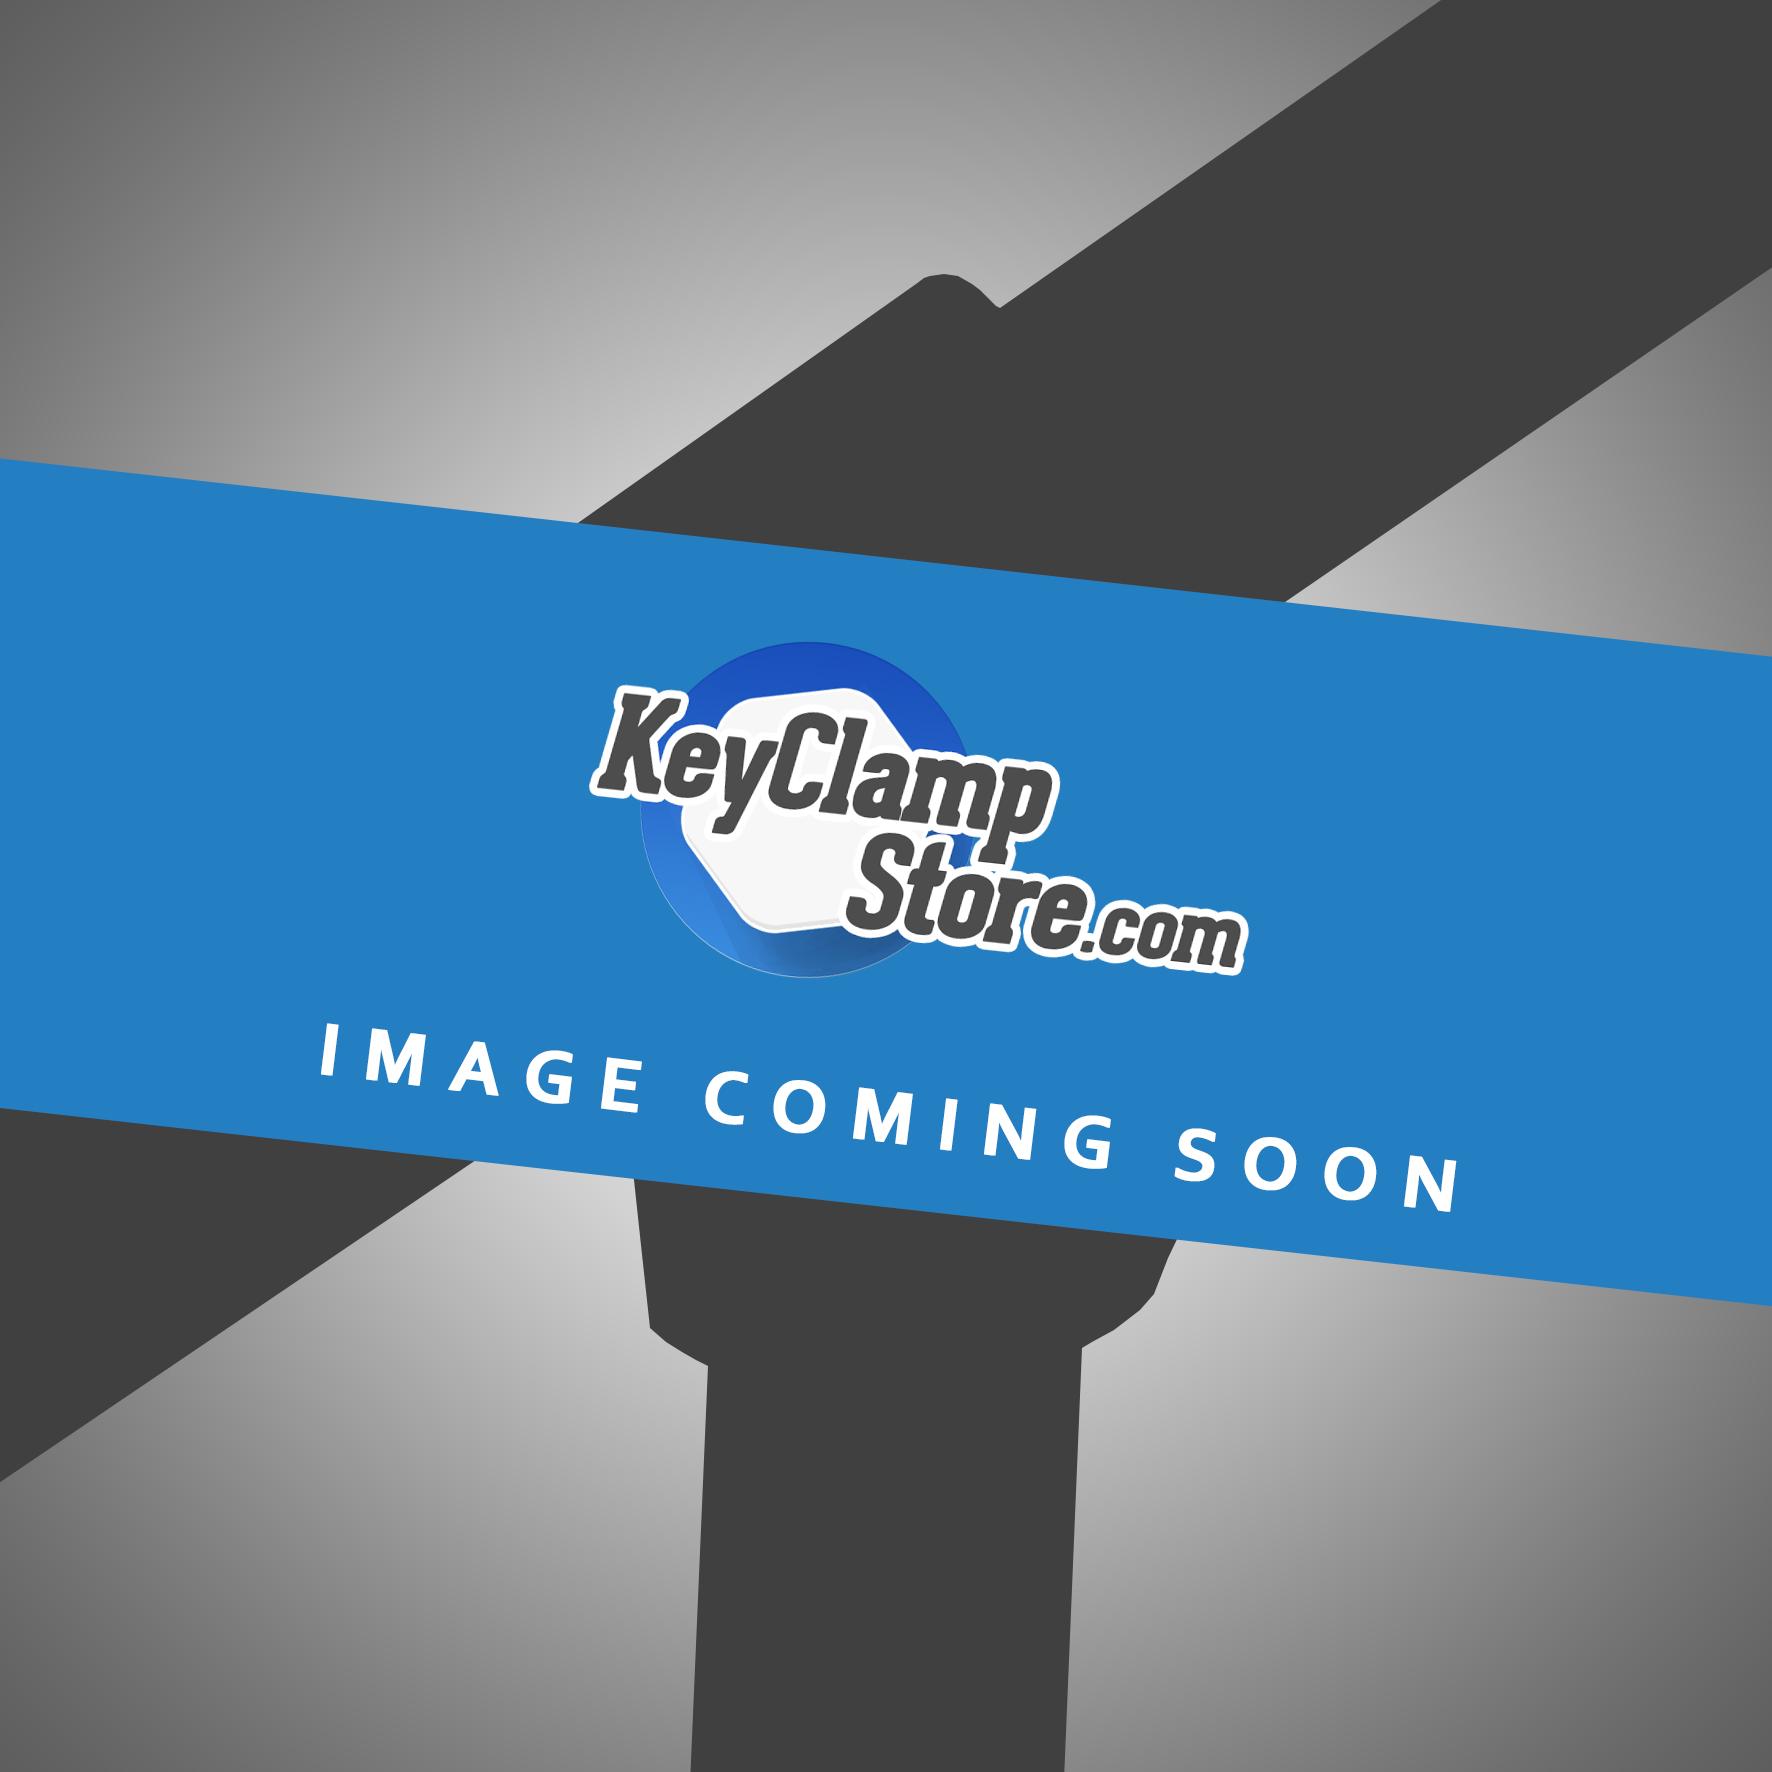 Key Clamp Short Tee 101 Single Tee 42mm